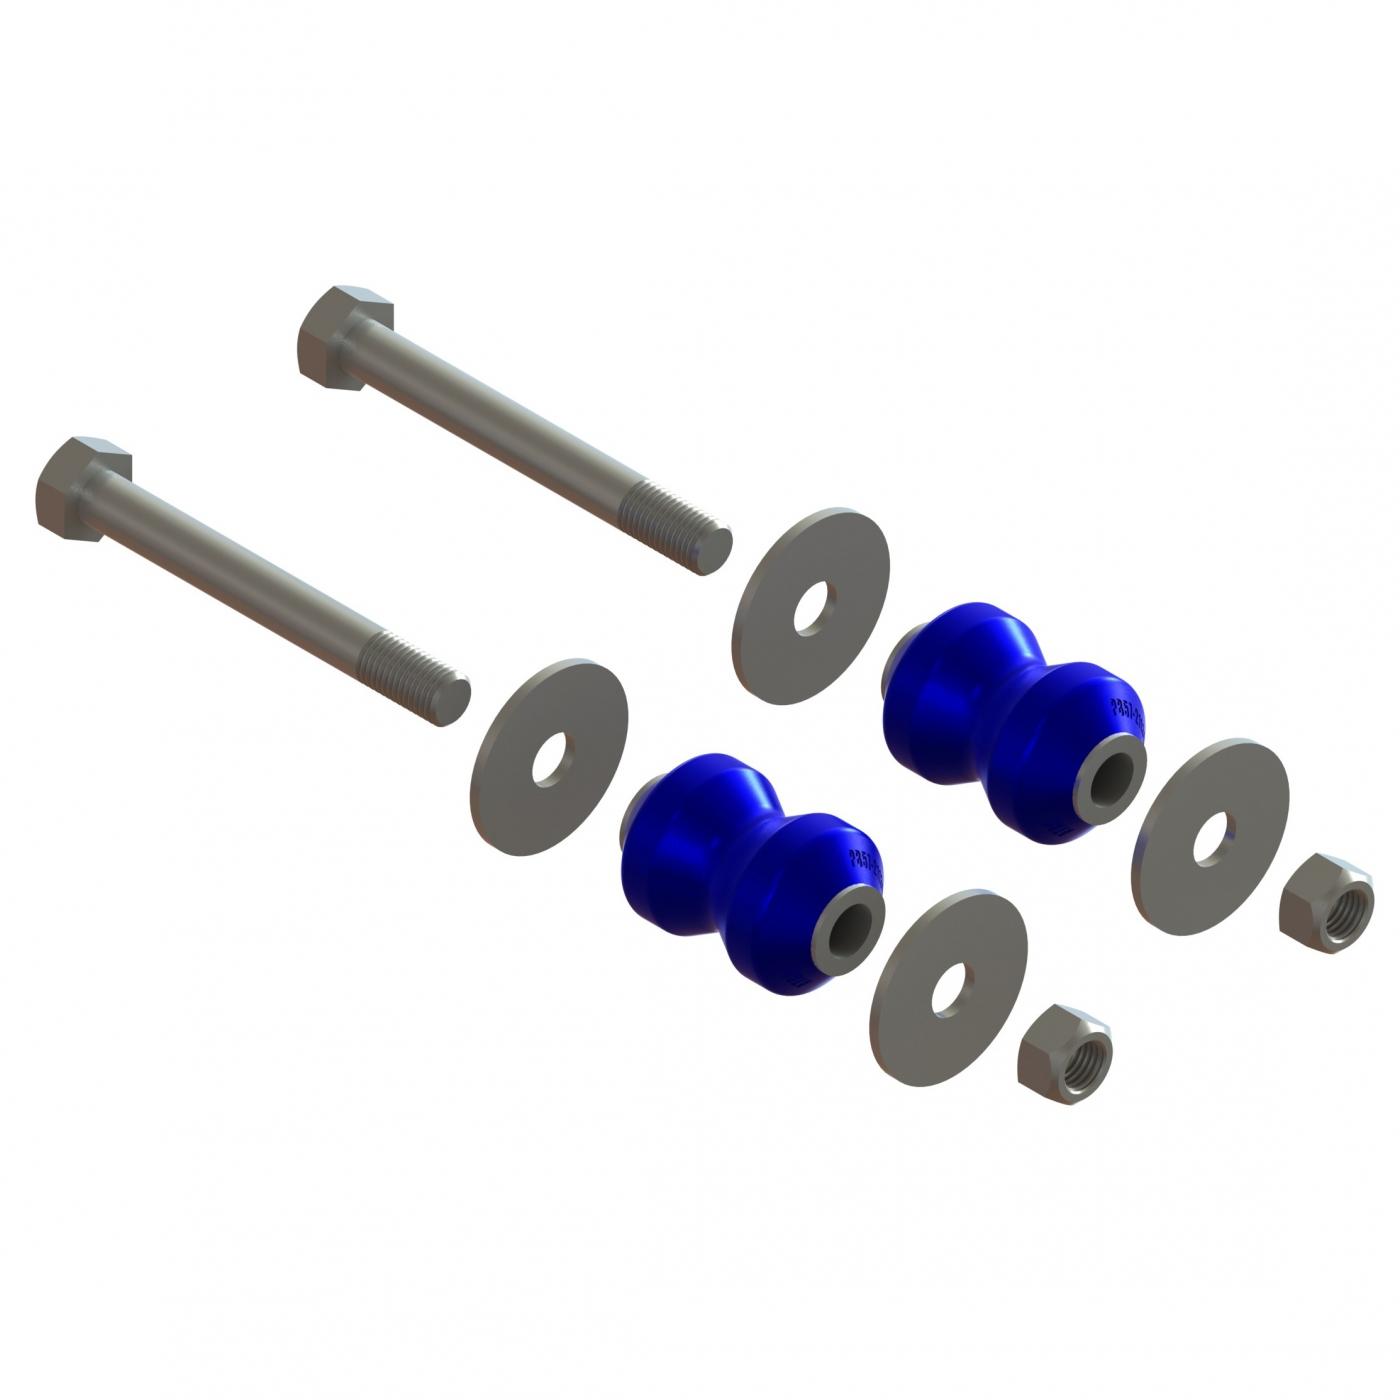 PB57-36200 : Pivot Bushing Kit (set of 2)